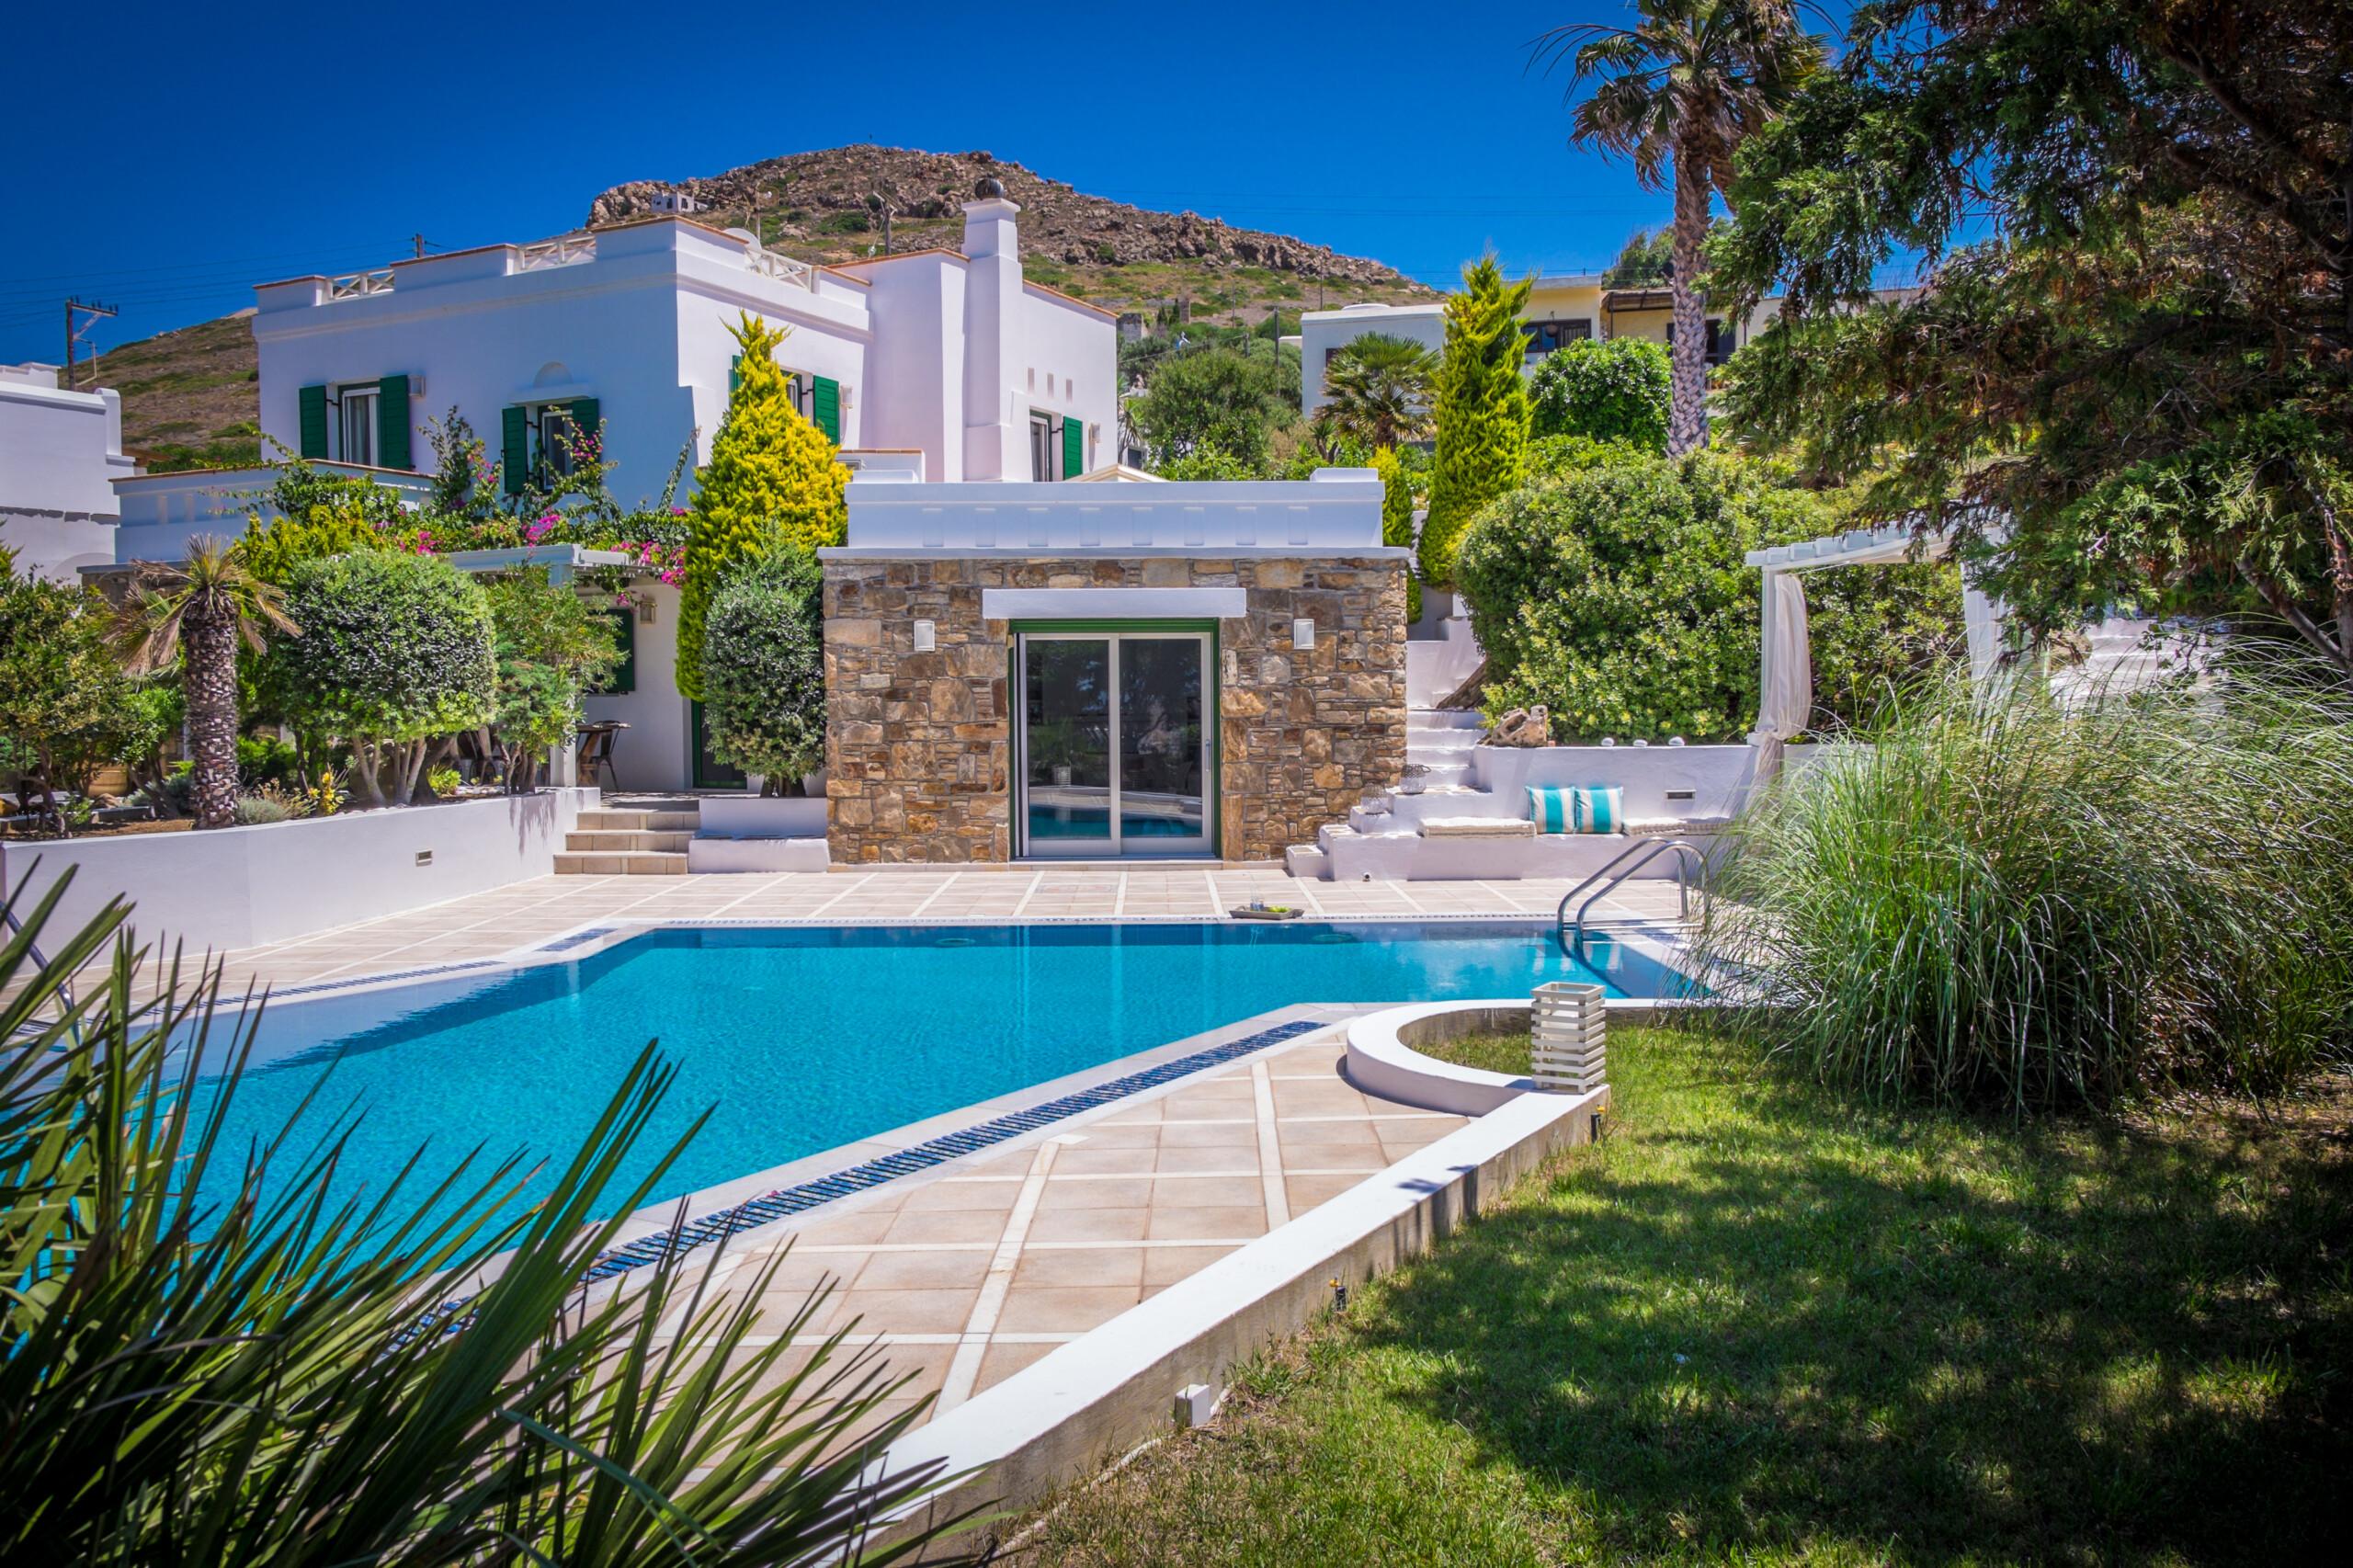 Montana Villa Naxos – 5 Bedrooms Villa with Private Pool